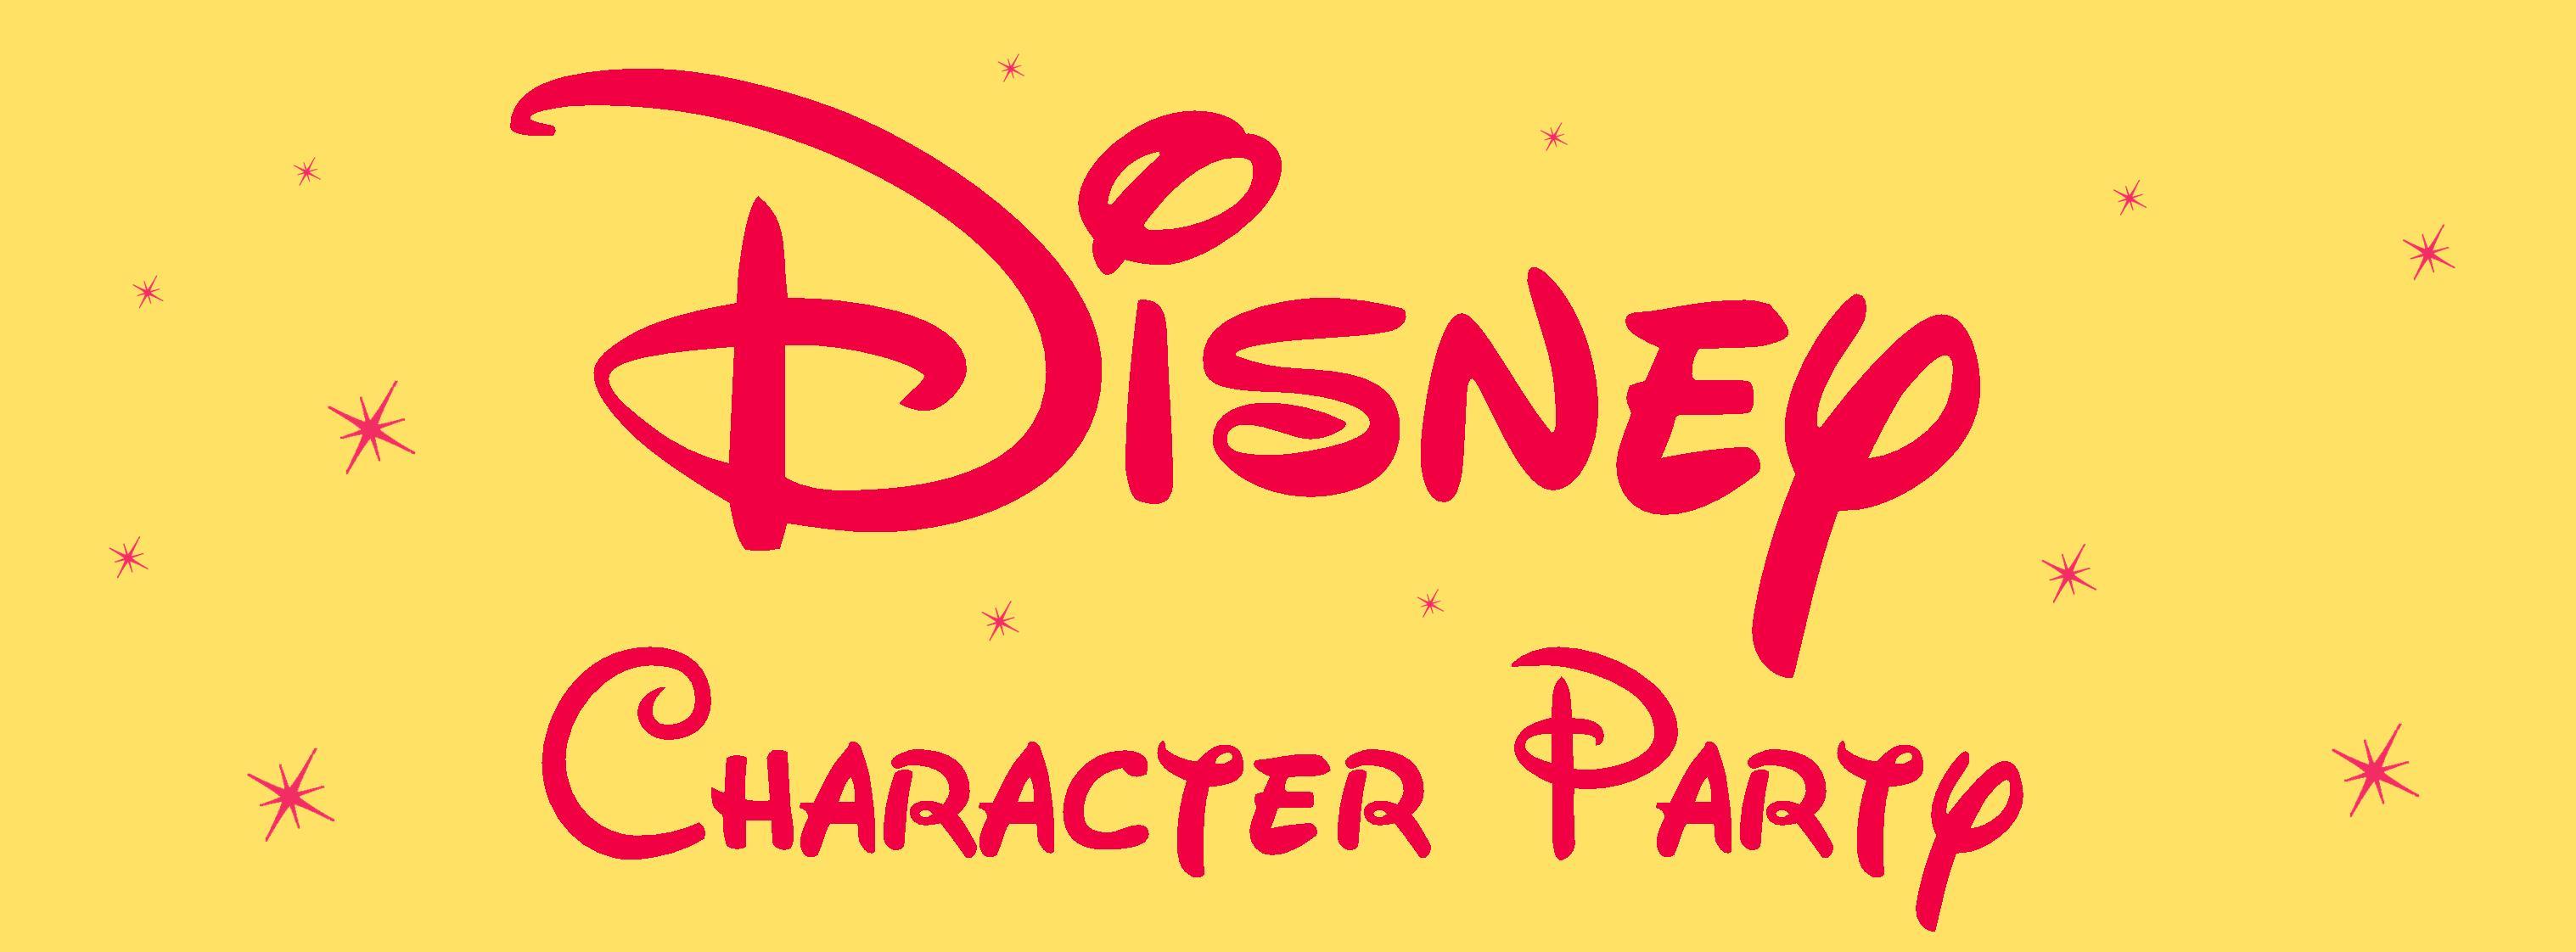 Disney character orgy